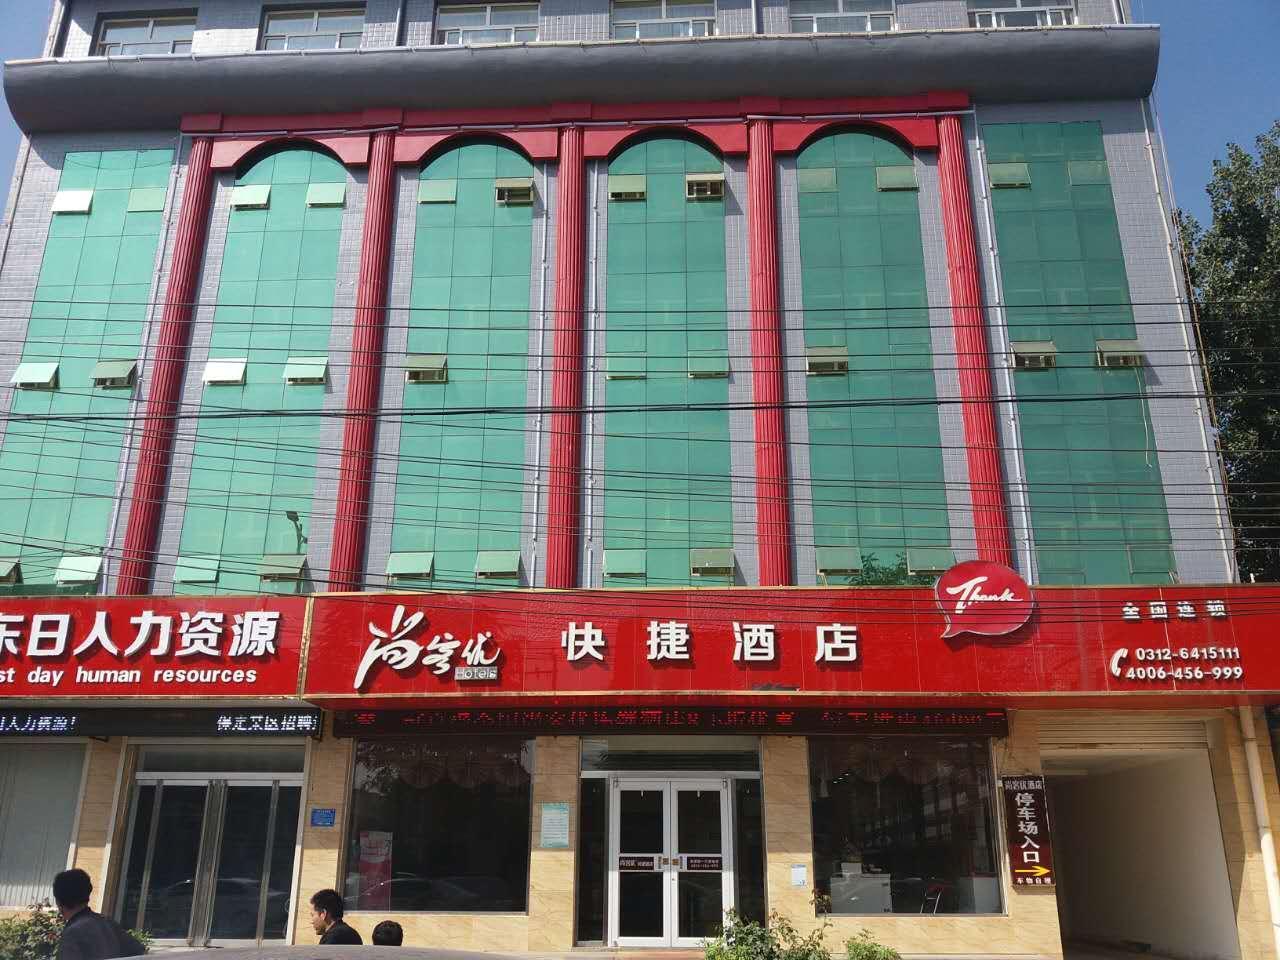 Thank Inn Hotel Hebei Baoding Tang County Zhongshan Bei Street